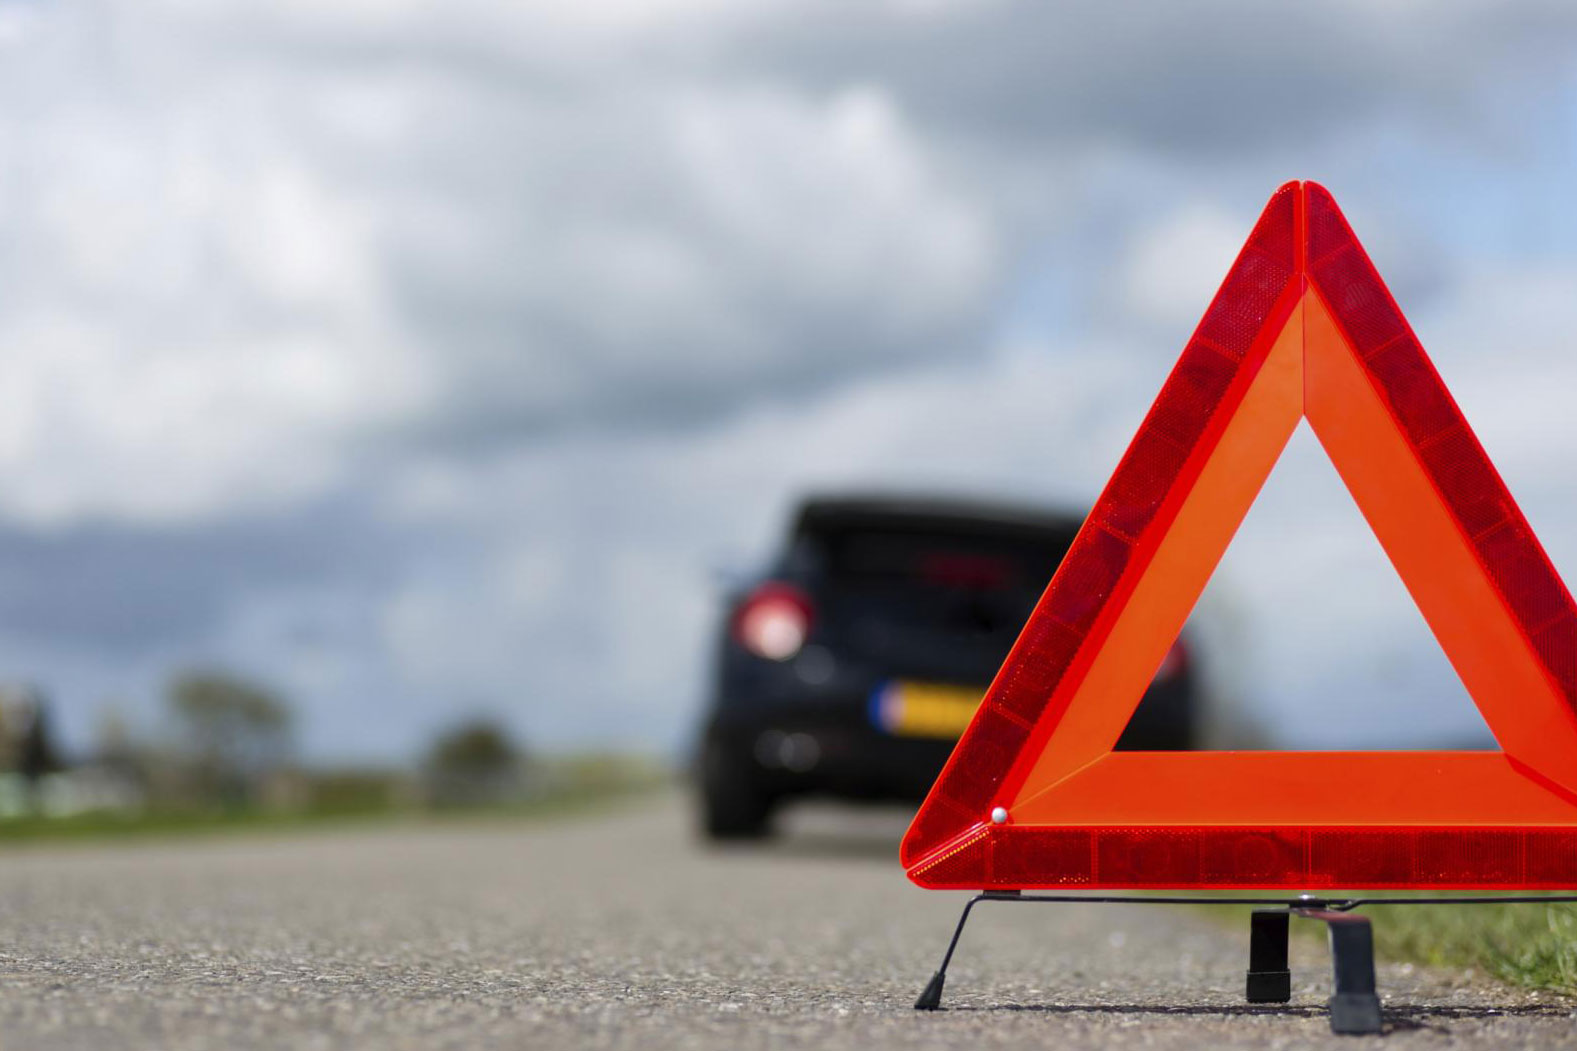 На трассе в Навлинском районе Mazda сбила пешехода